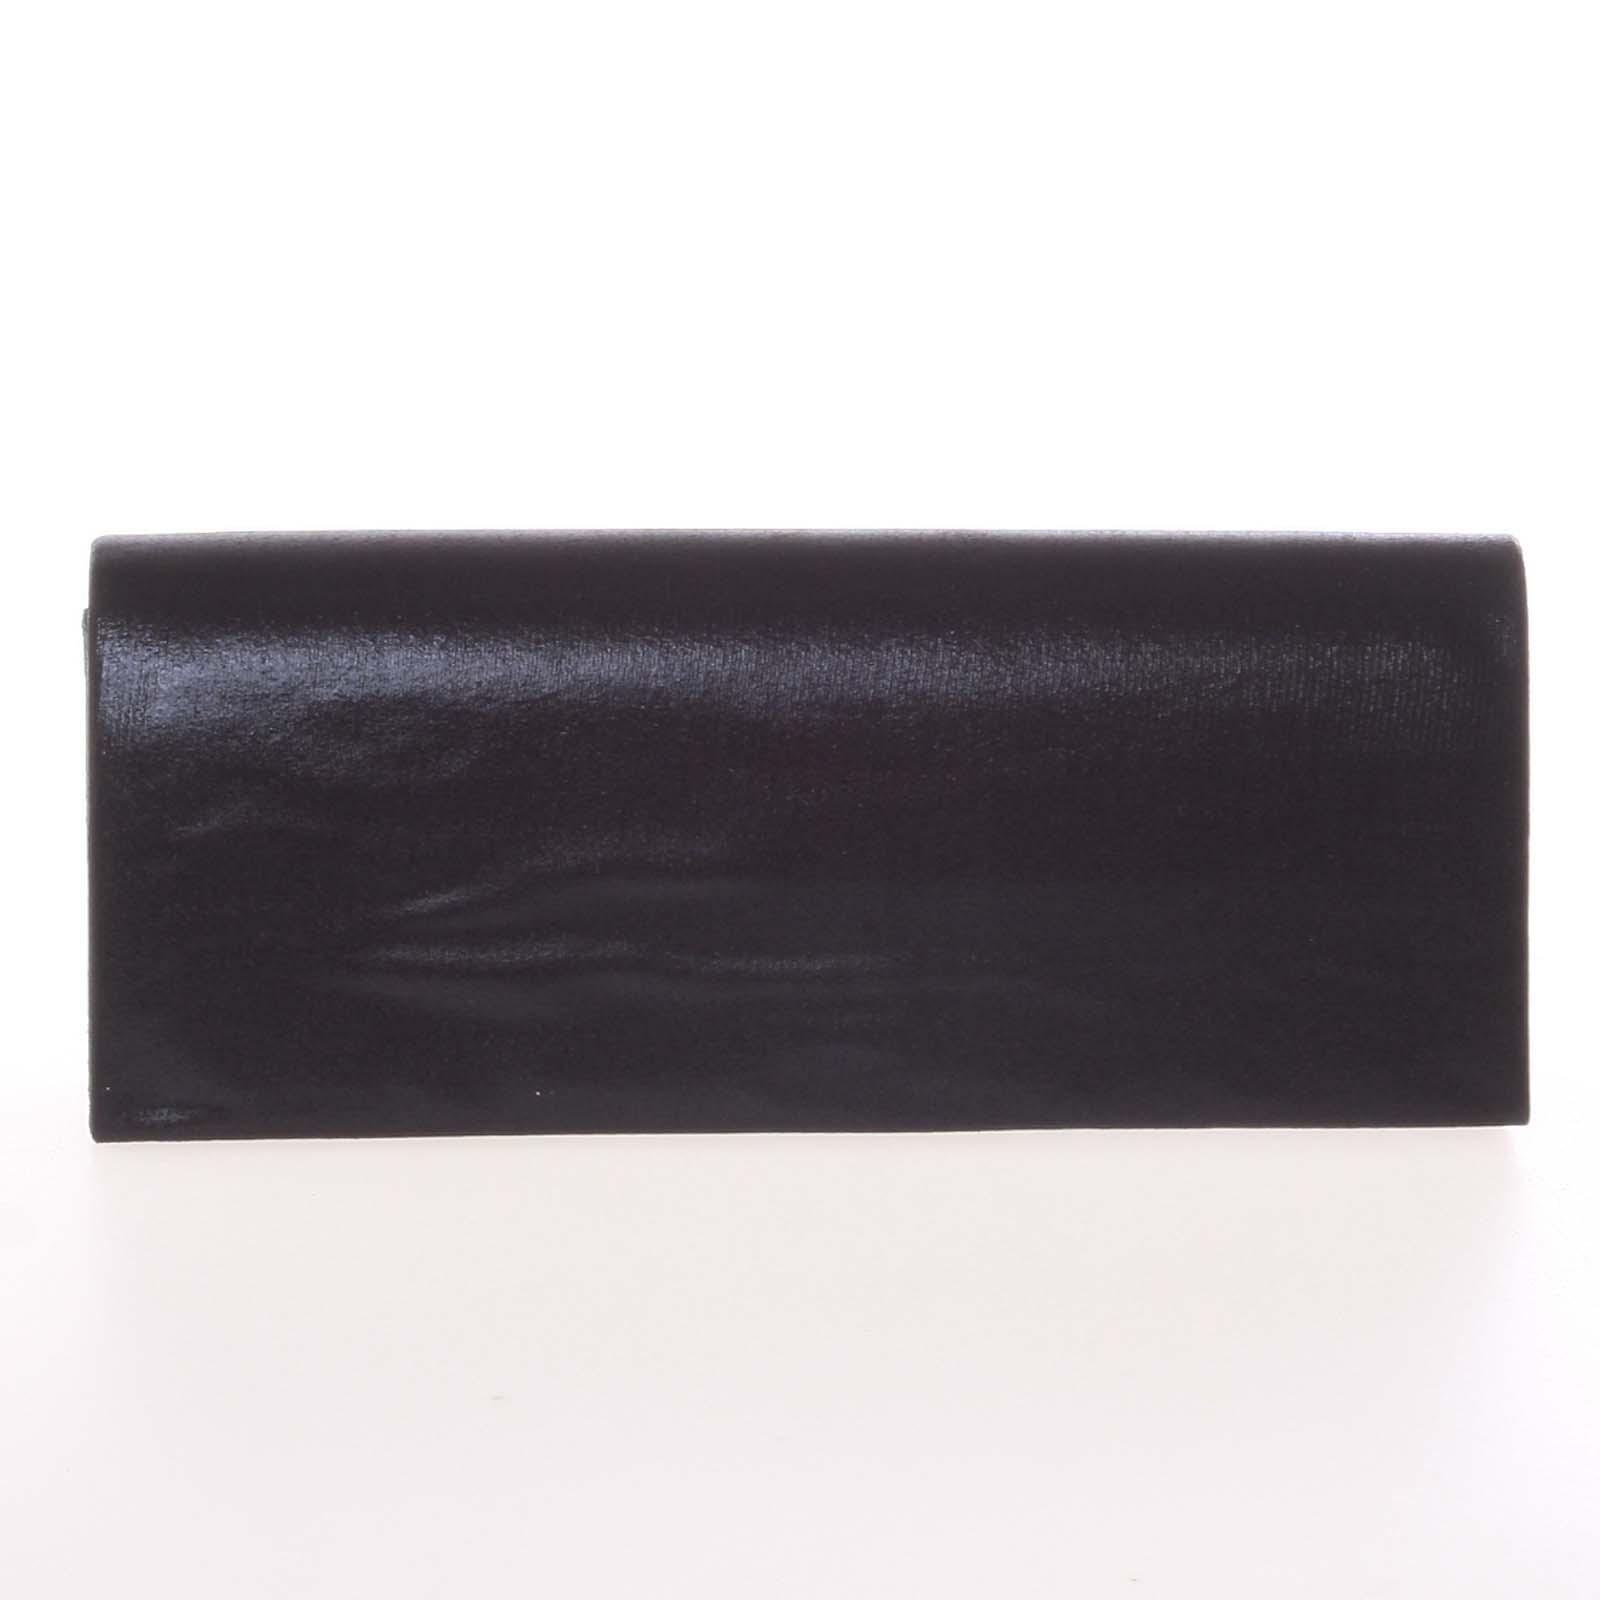 Decentná saténová listová kabelka čierna - Delami P355